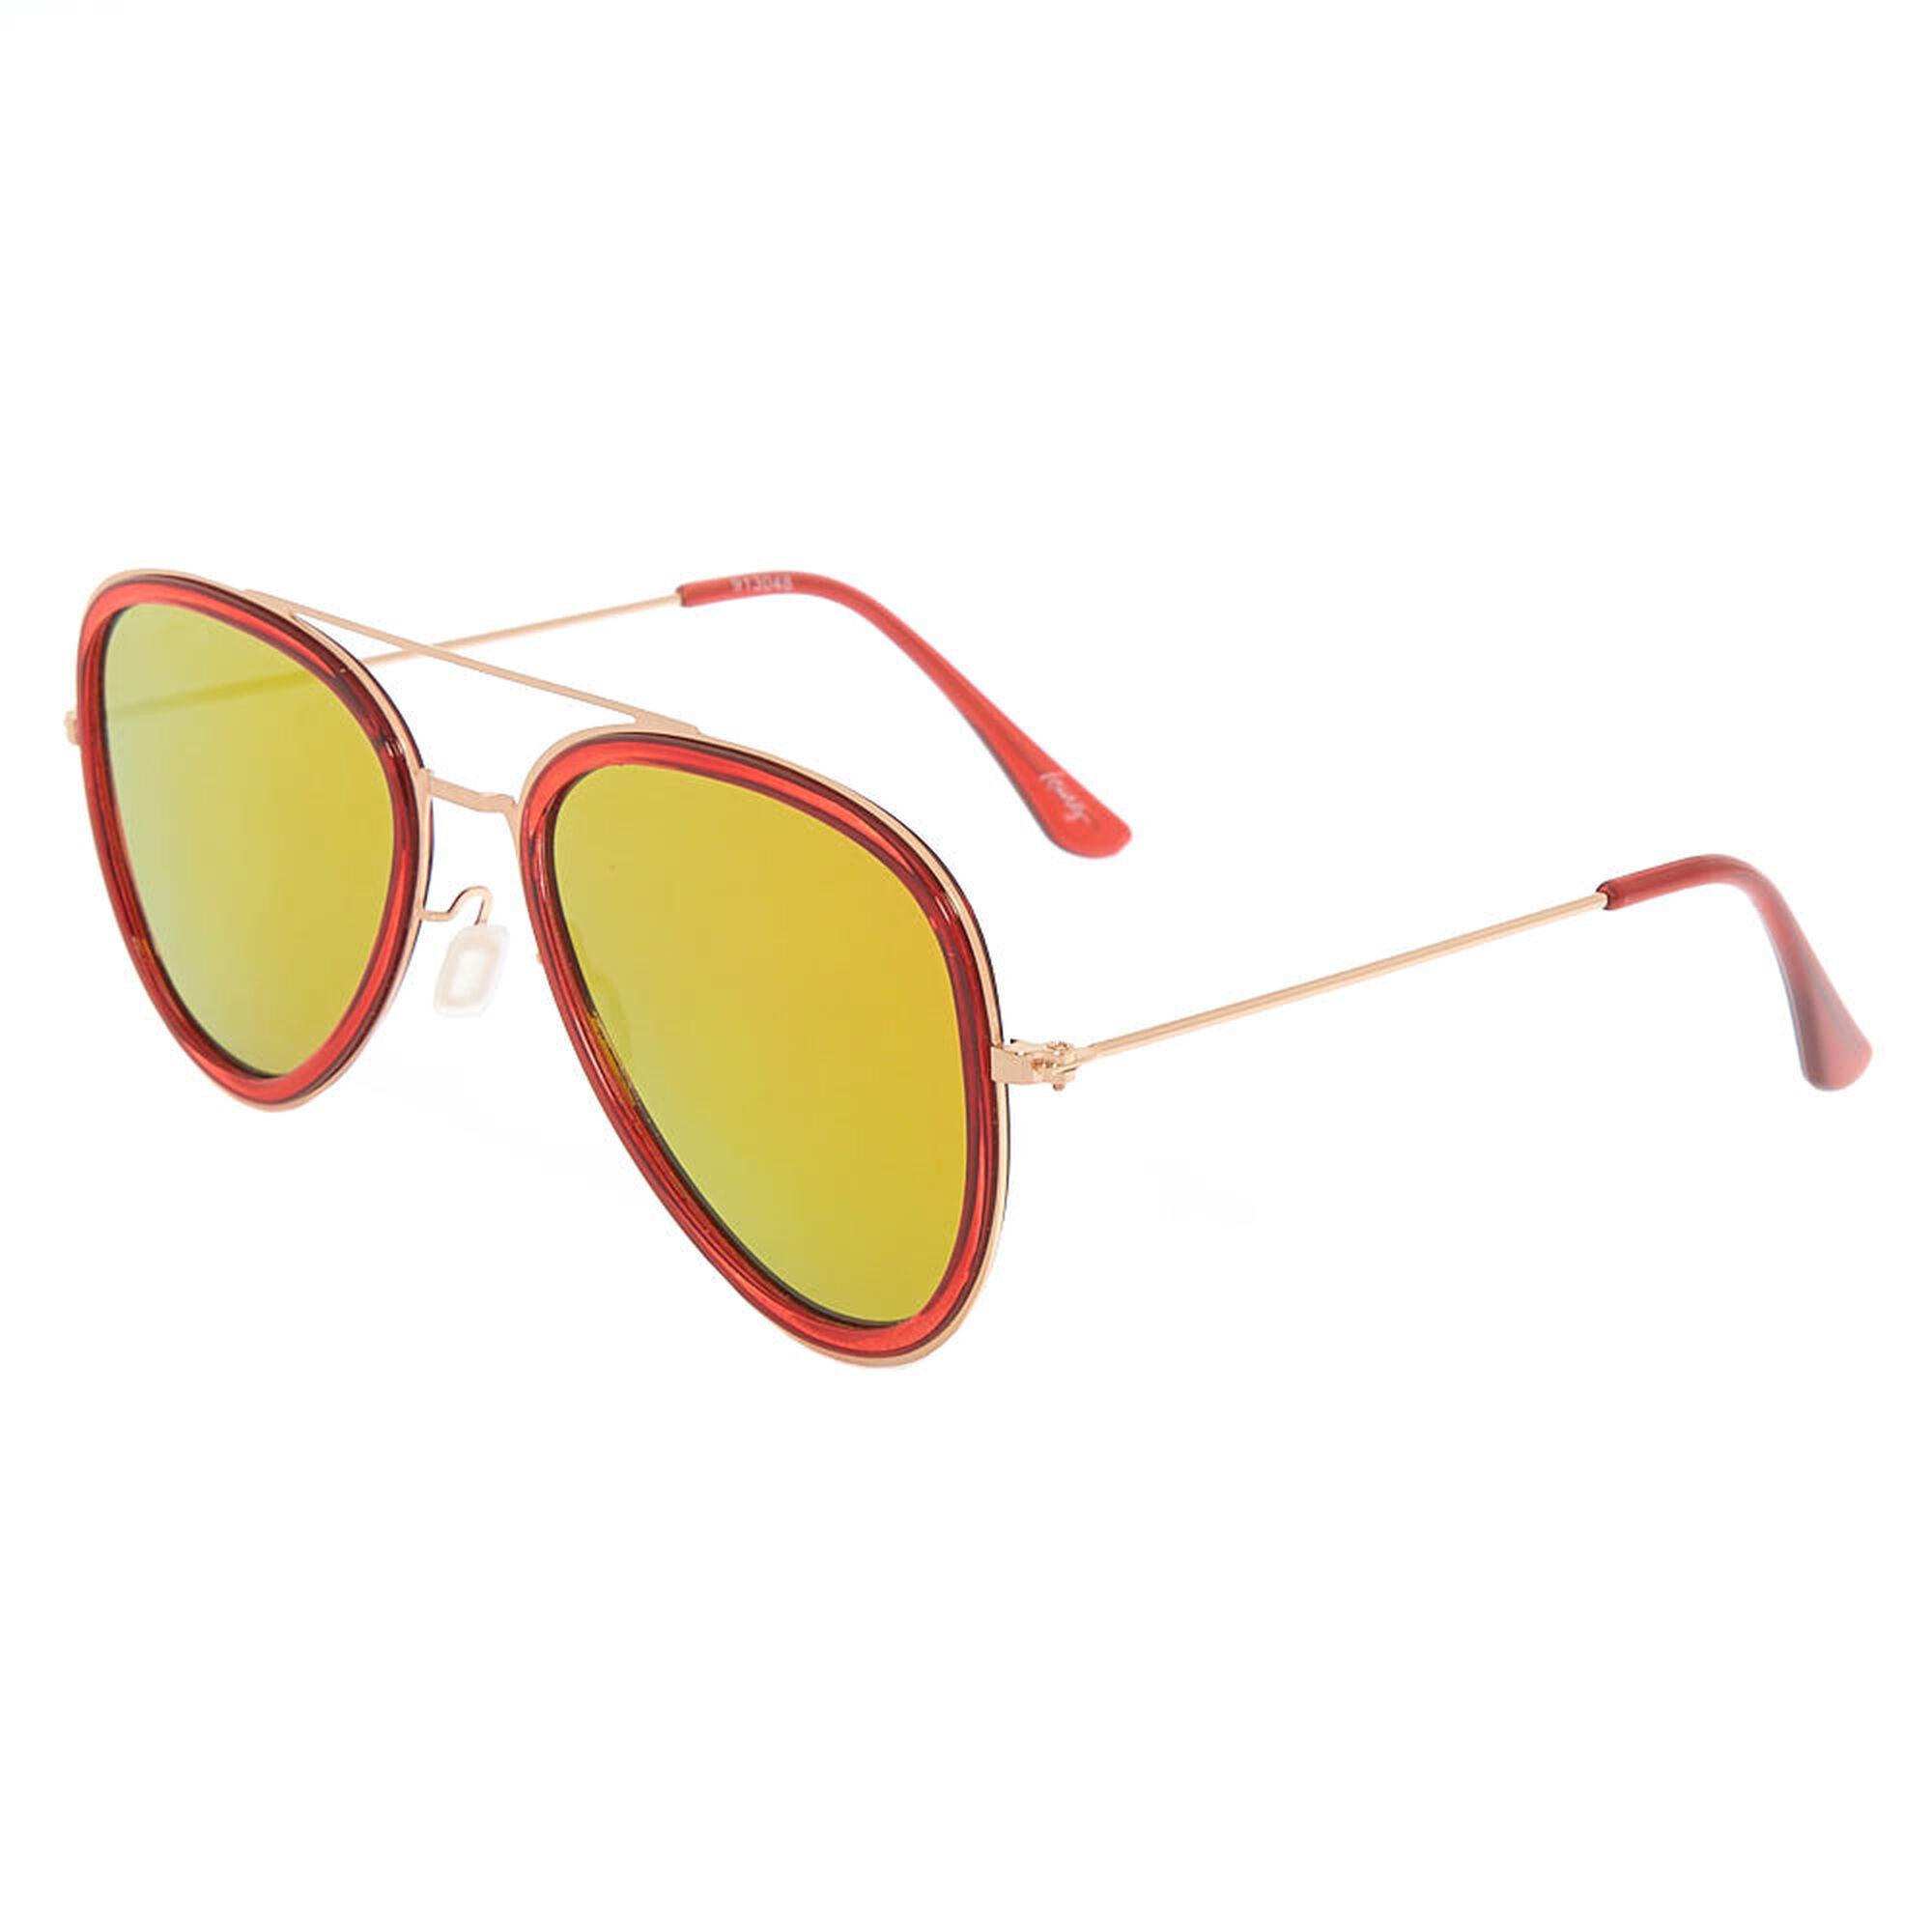 Metallic Frame Aviator Sunglasses - Red | Icing US